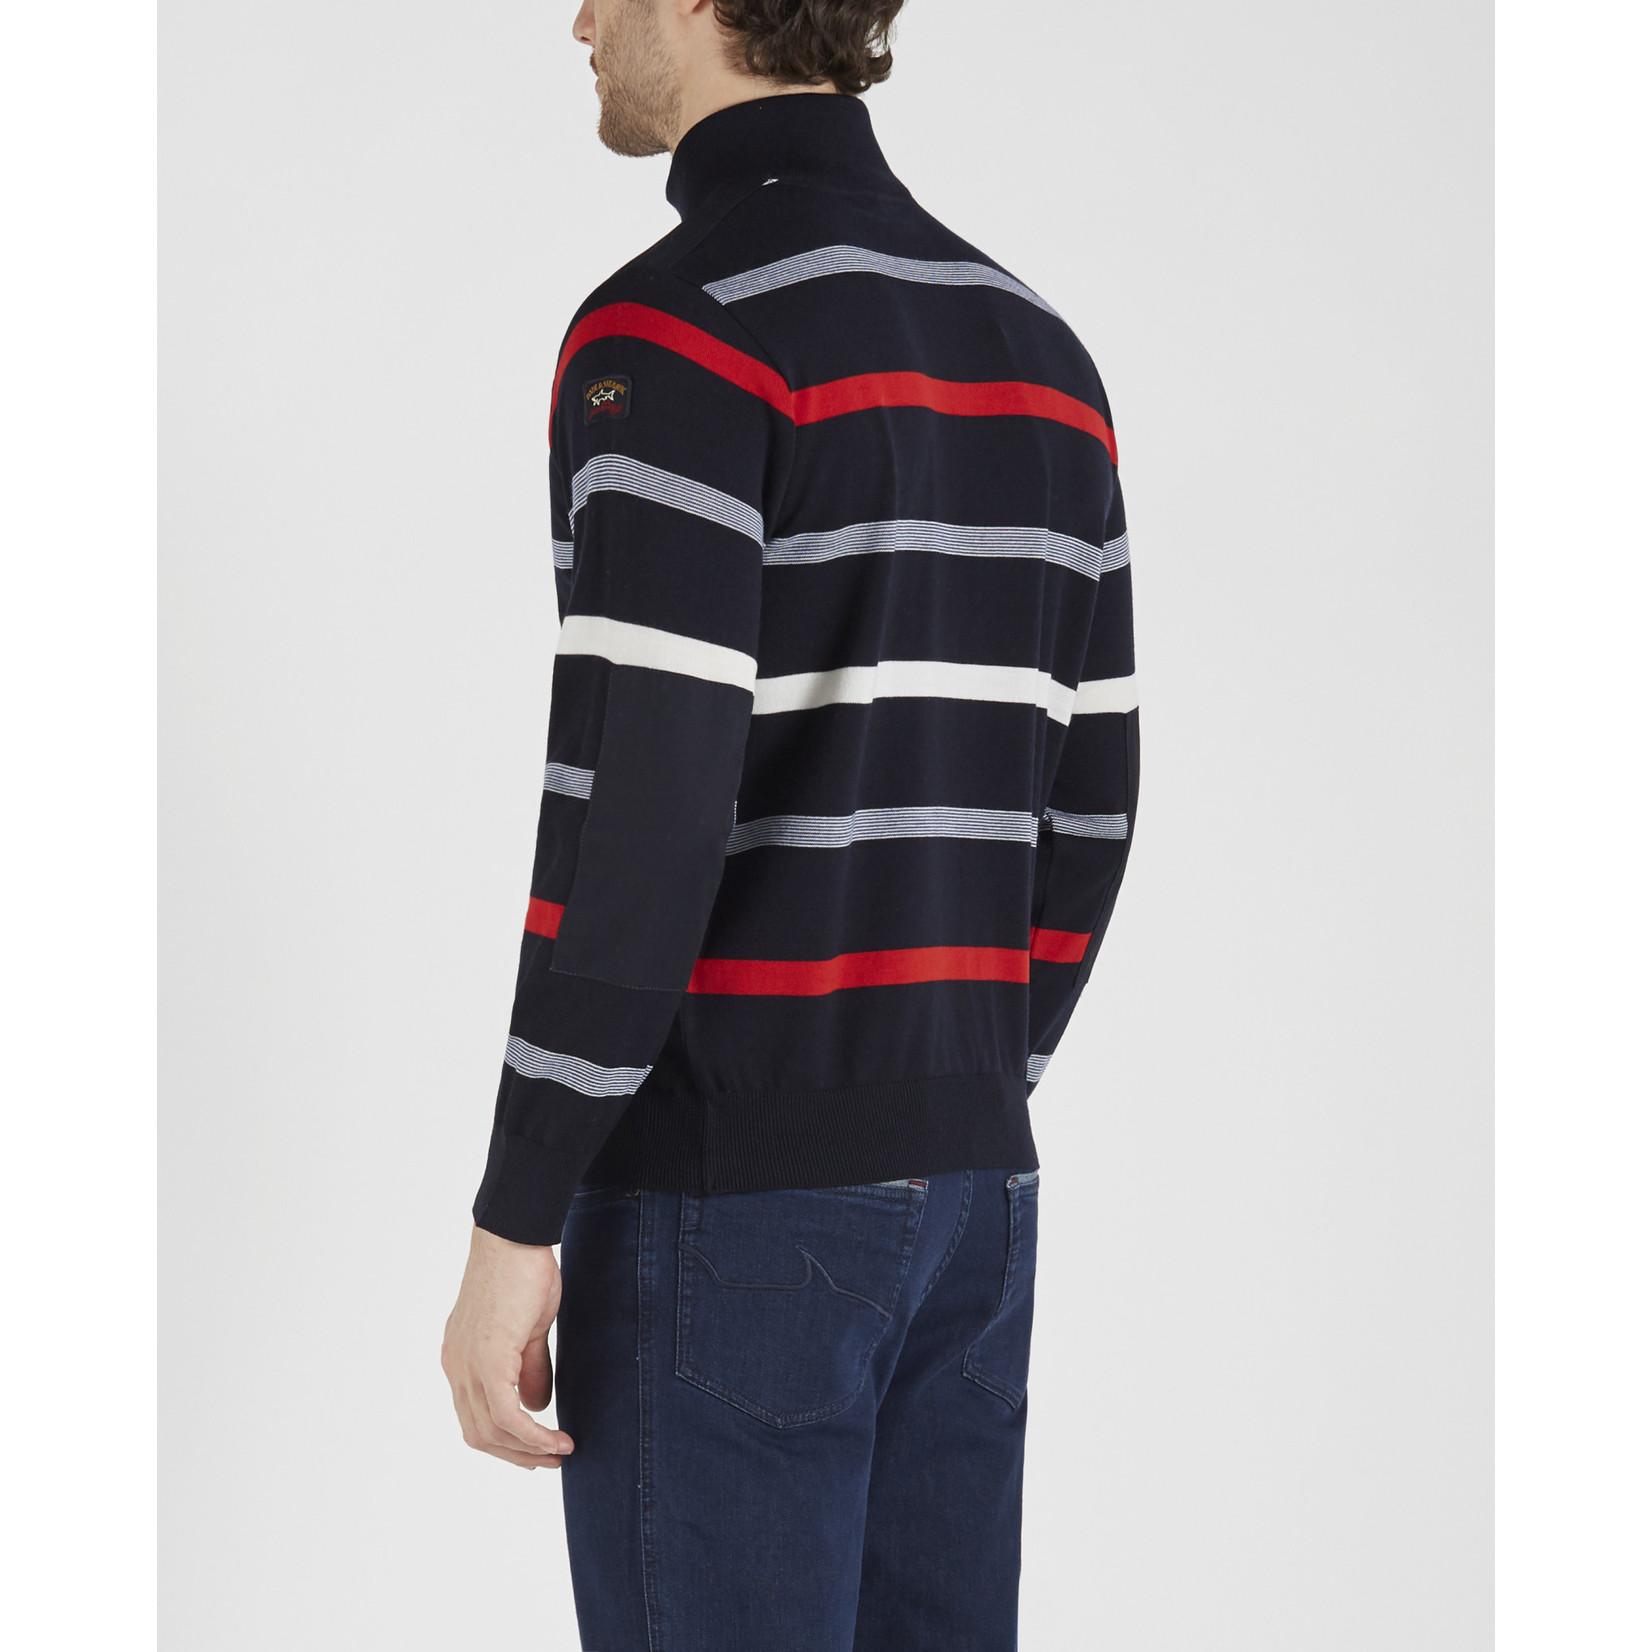 Paul & Shark rits pullover rode strepen